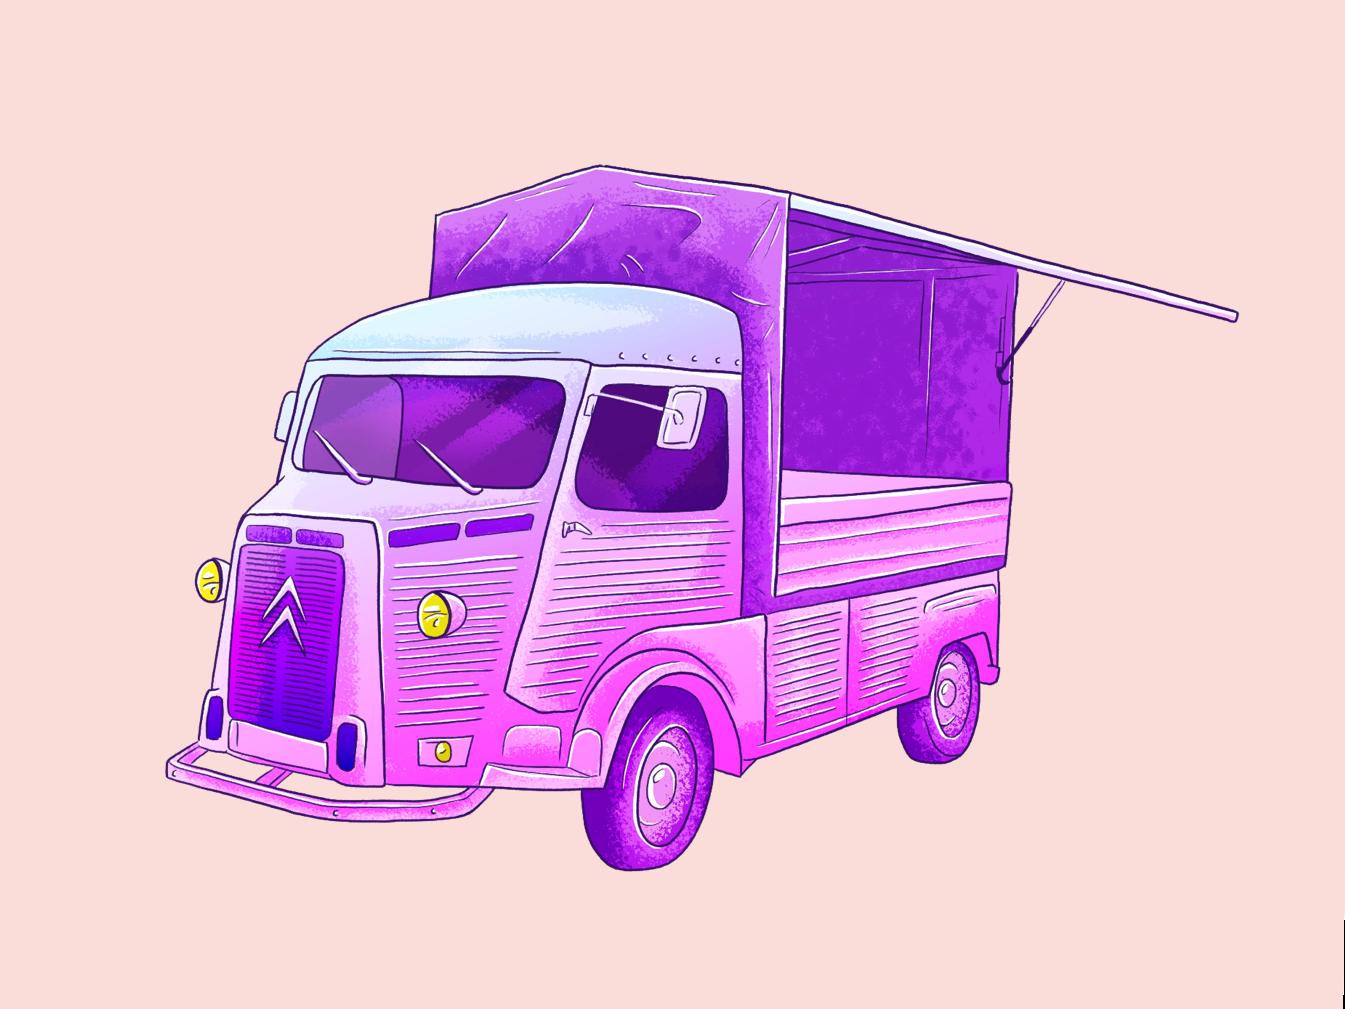 Truck photoshop adobe texture vehicle help empty wacom cintiq brush illustration truck